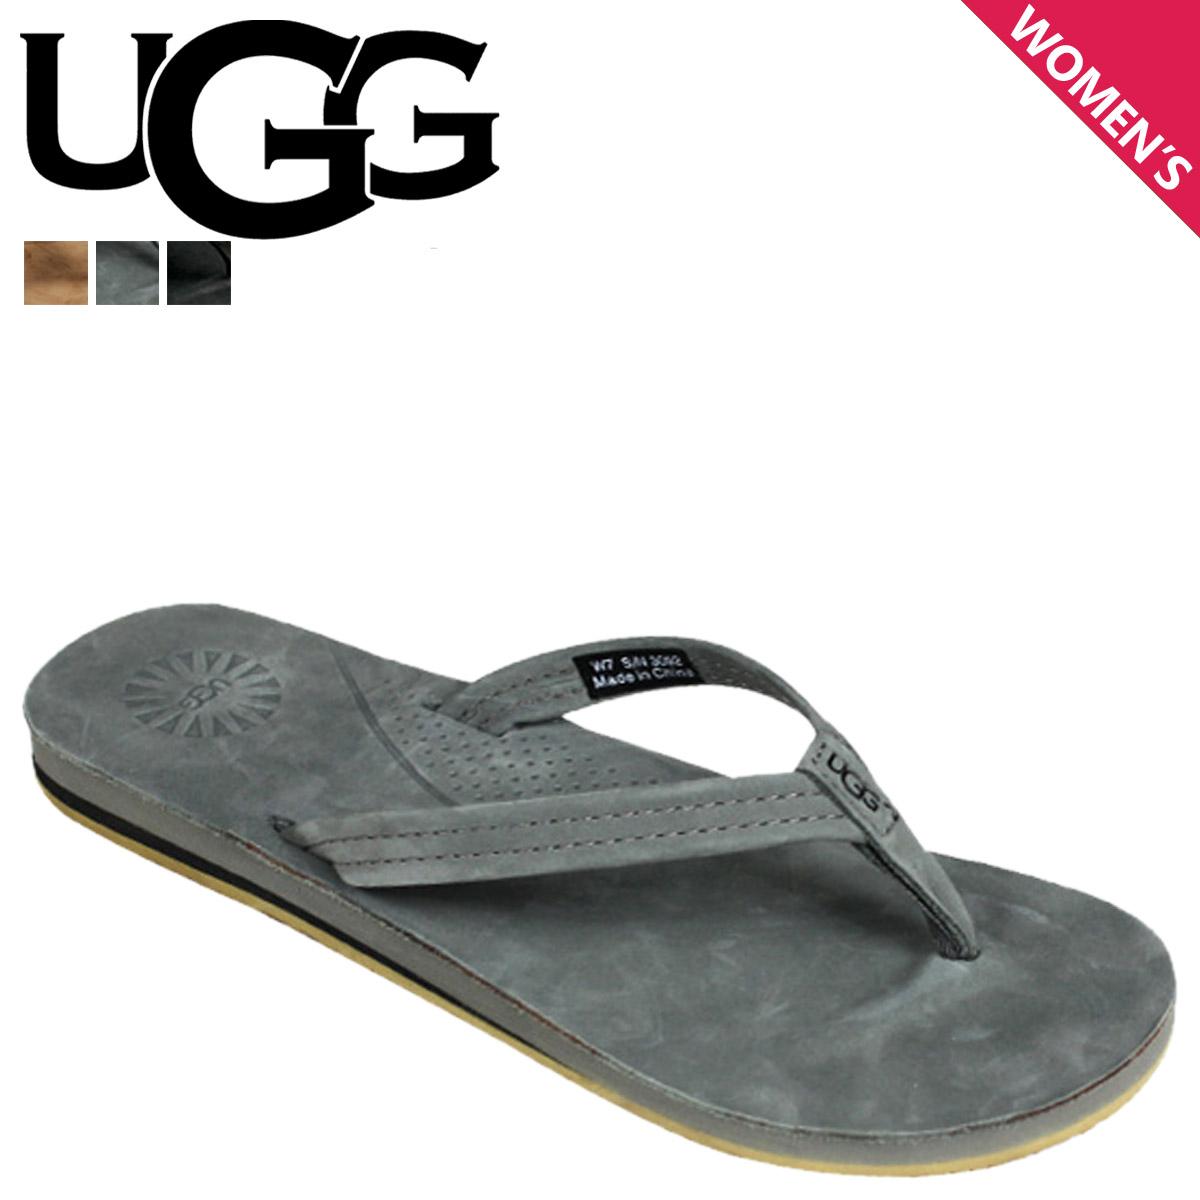 Sugar Online Shop | Rakuten Global Market: Point 2 x 3 color UGG UGG women's Kayla flip flops WOMENS KAYLA nubuck women's Sandals 2014 SPRING new 3092 ...